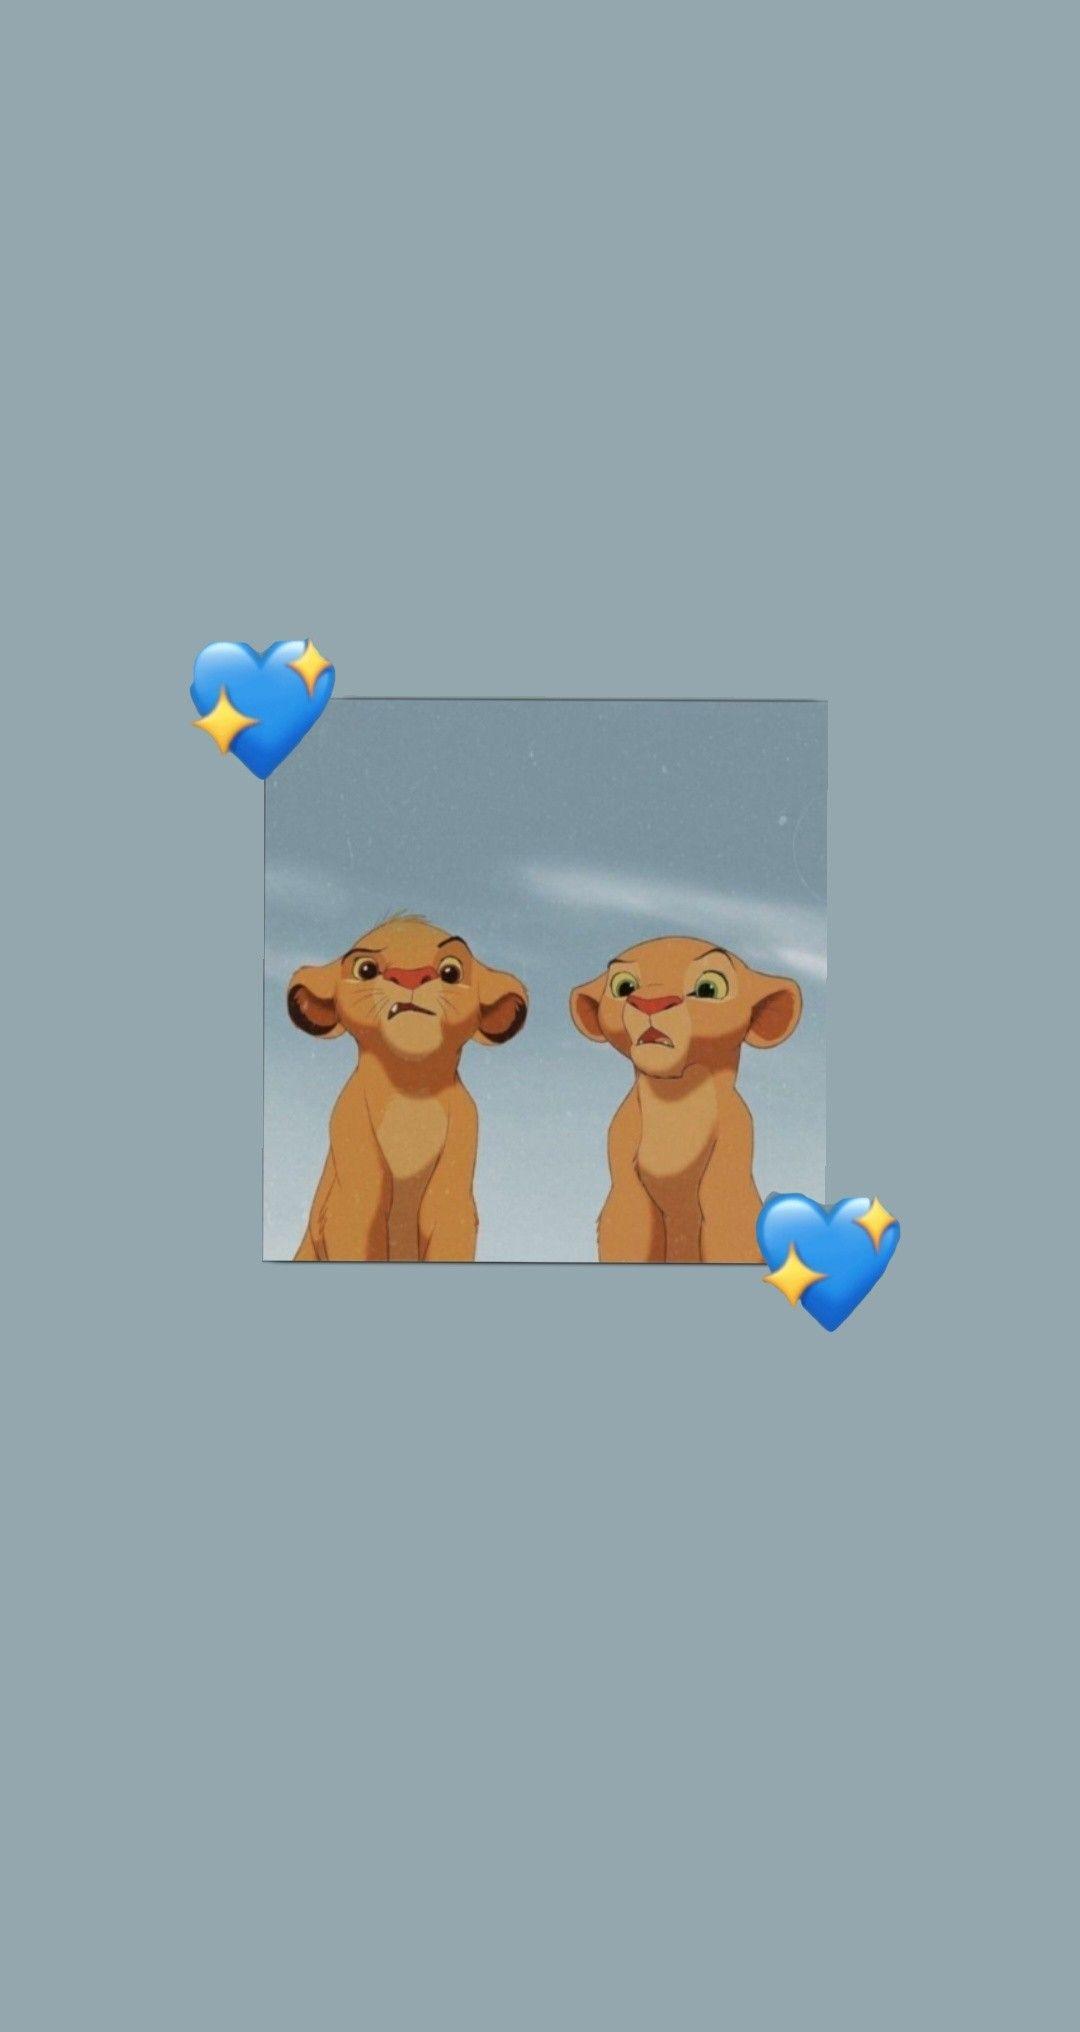 Simba Et Nala En 2020 Le Roi Lion Photos De Lion Roi Lion Simba